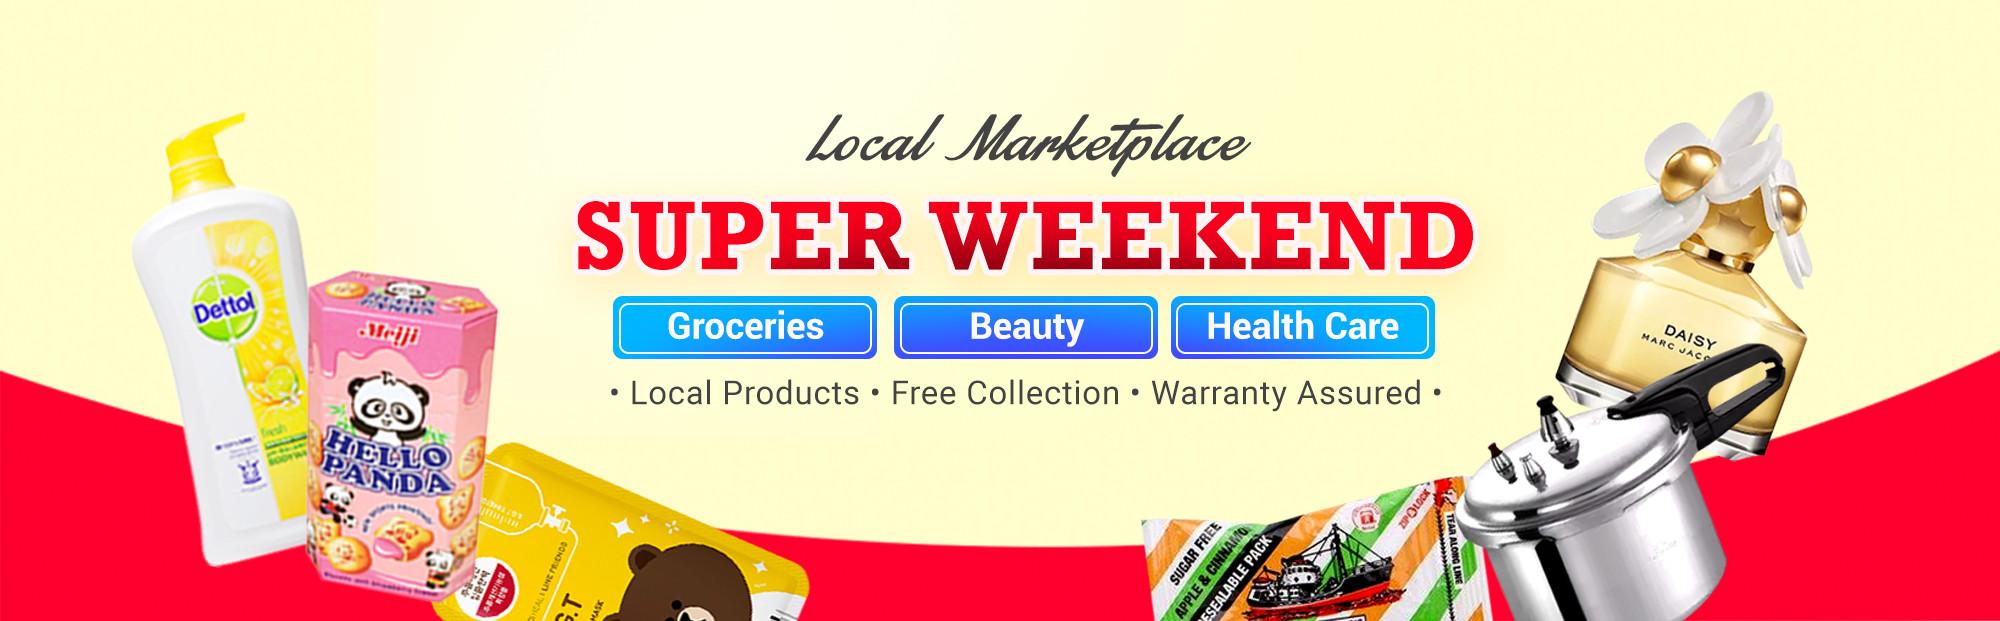 Super Weekend Sale Groceries Beauty Health Malaysia Local Bigen Speedy 2 X 30gr Marketplace Shop Online At Ezbuy